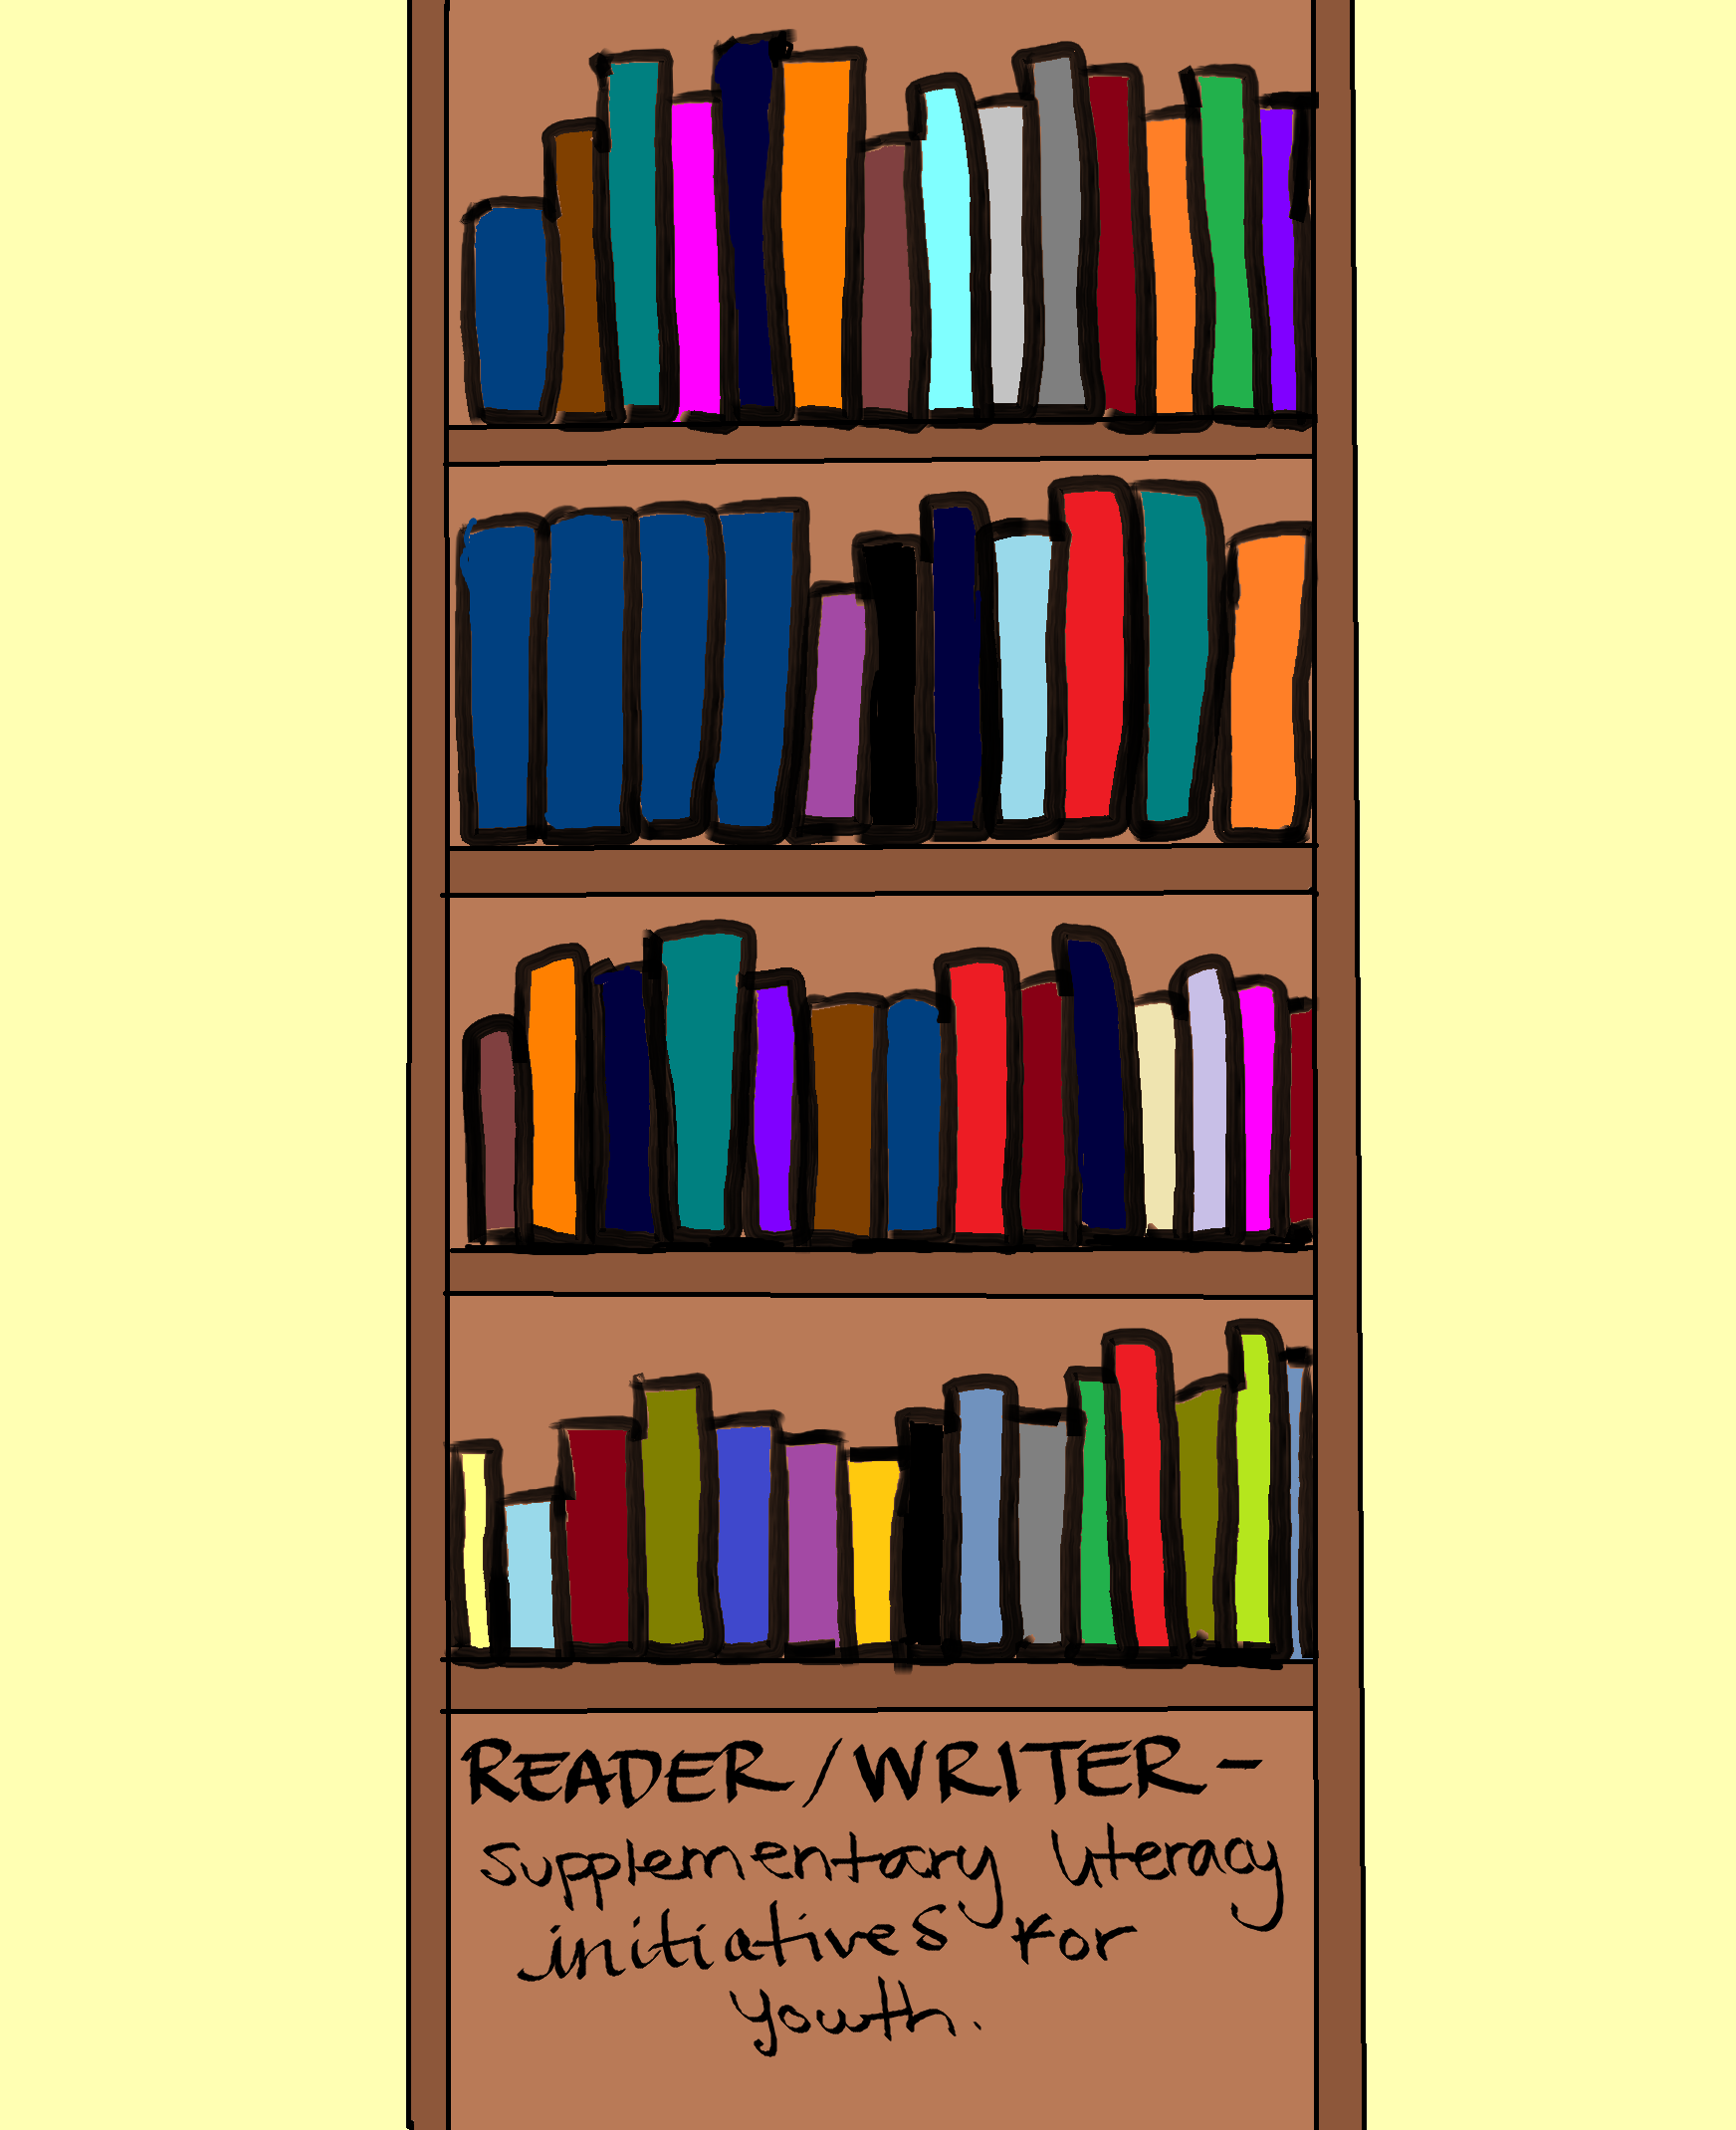 bookshelf 2.png